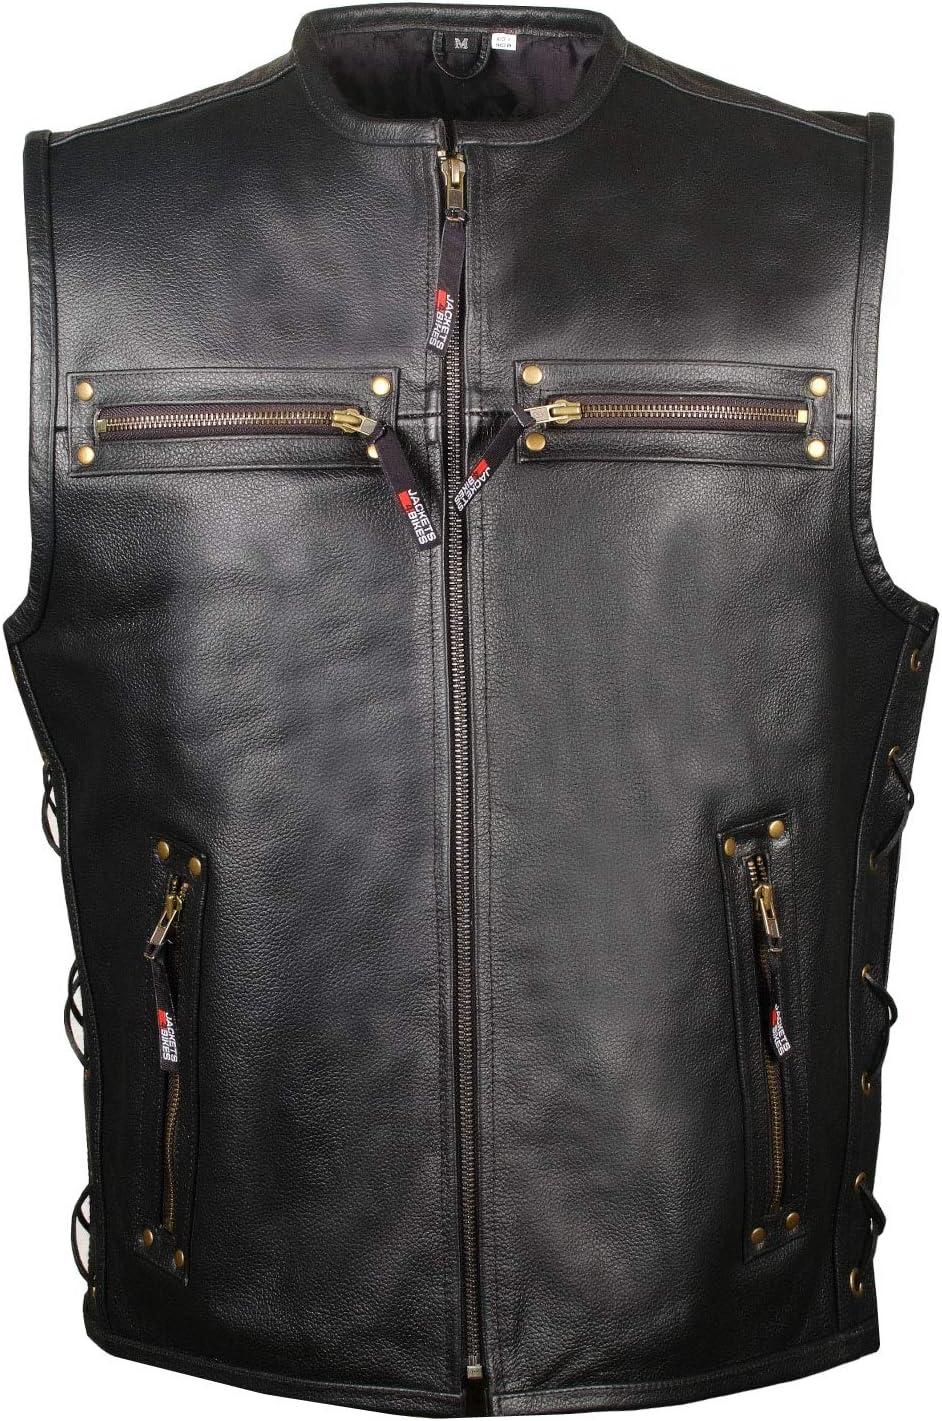 Viking Cycle Gardar Genuine Buffalo Leather Motorcycle Vest for Men Biker Club Vest with Concealed Carry Hidden Pocket